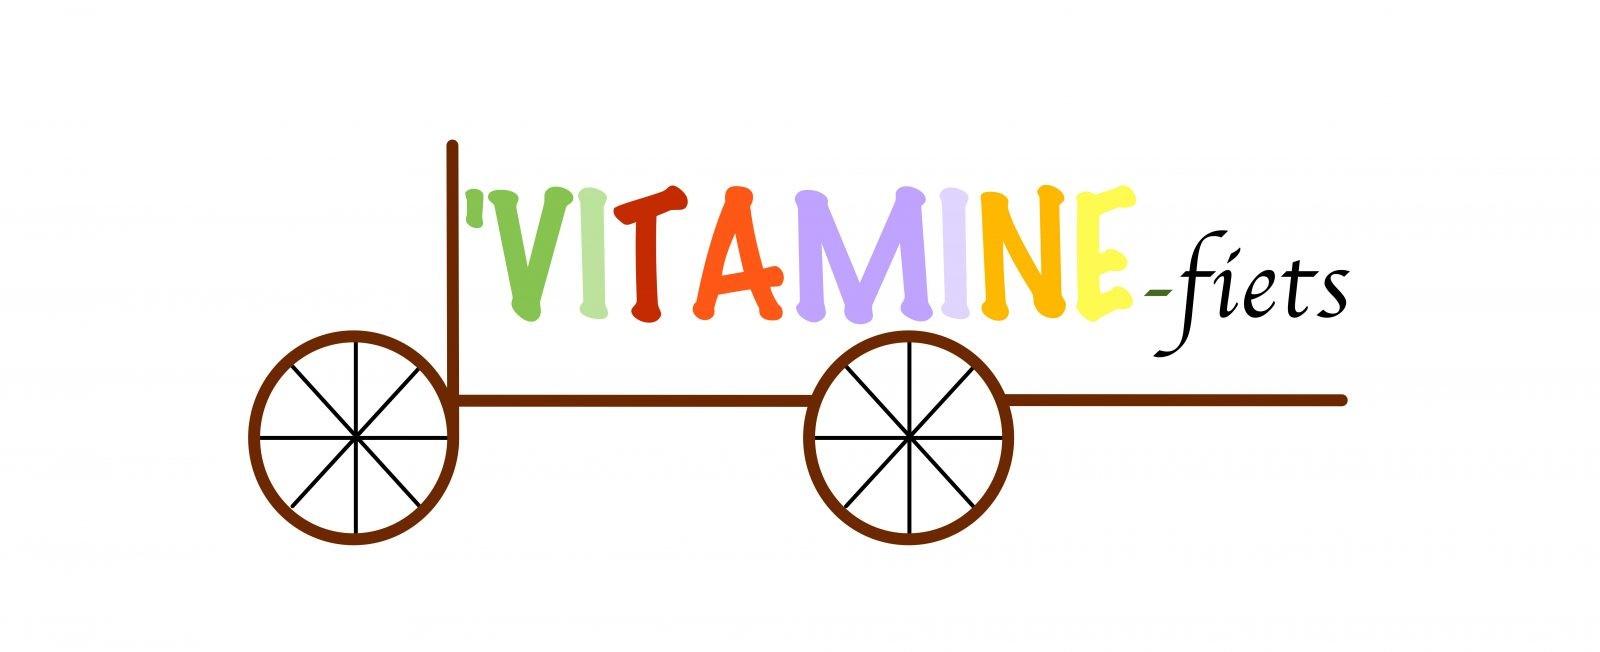 vitamine fiets - Winkels